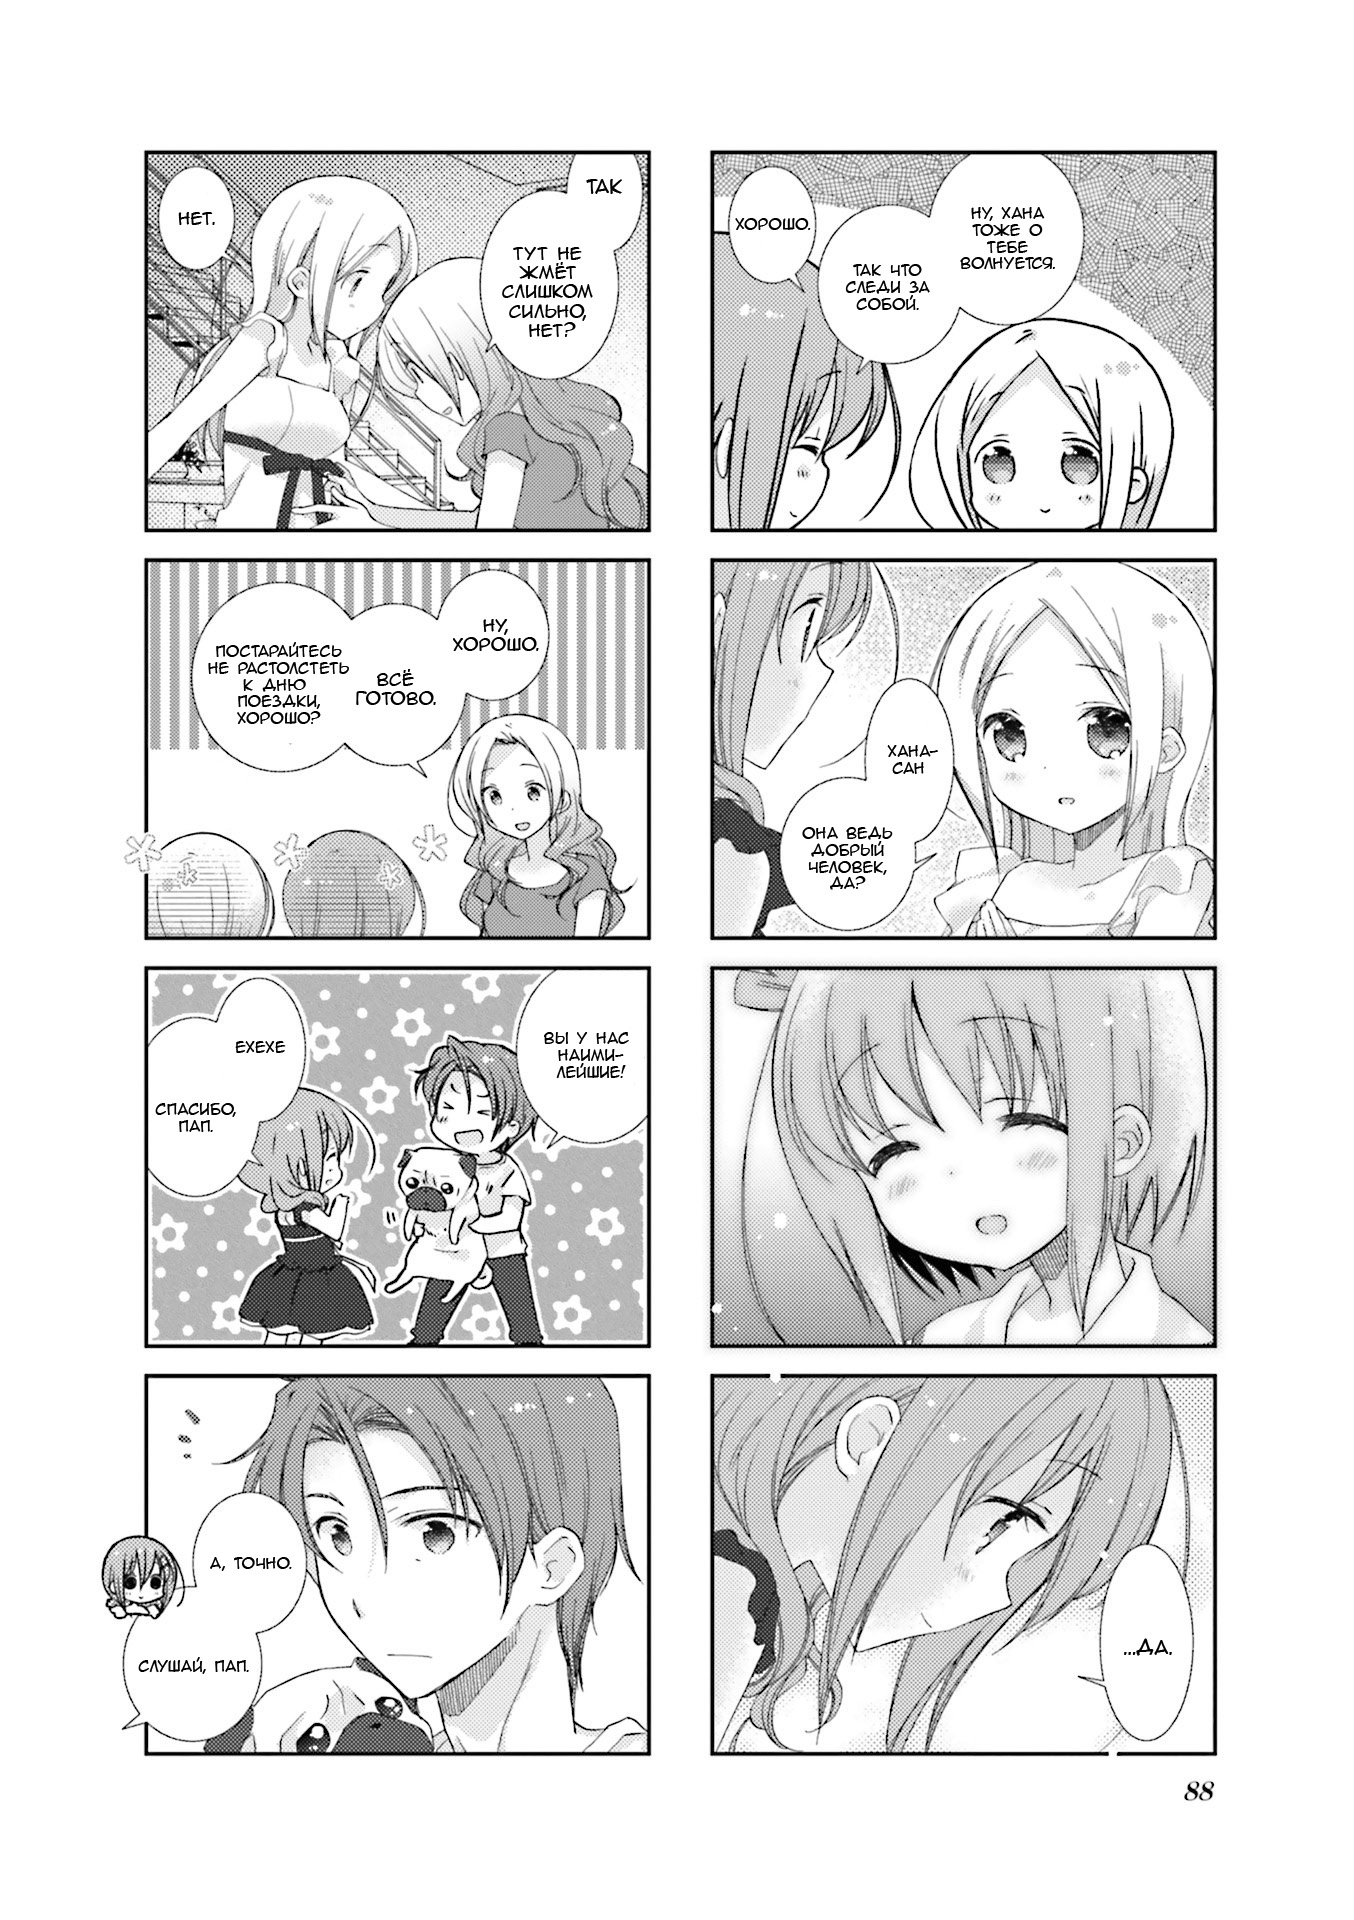 https://r2.ninemanga.com/comics/pic4/59/33723/1351205/1559333888289.jpg Page 6